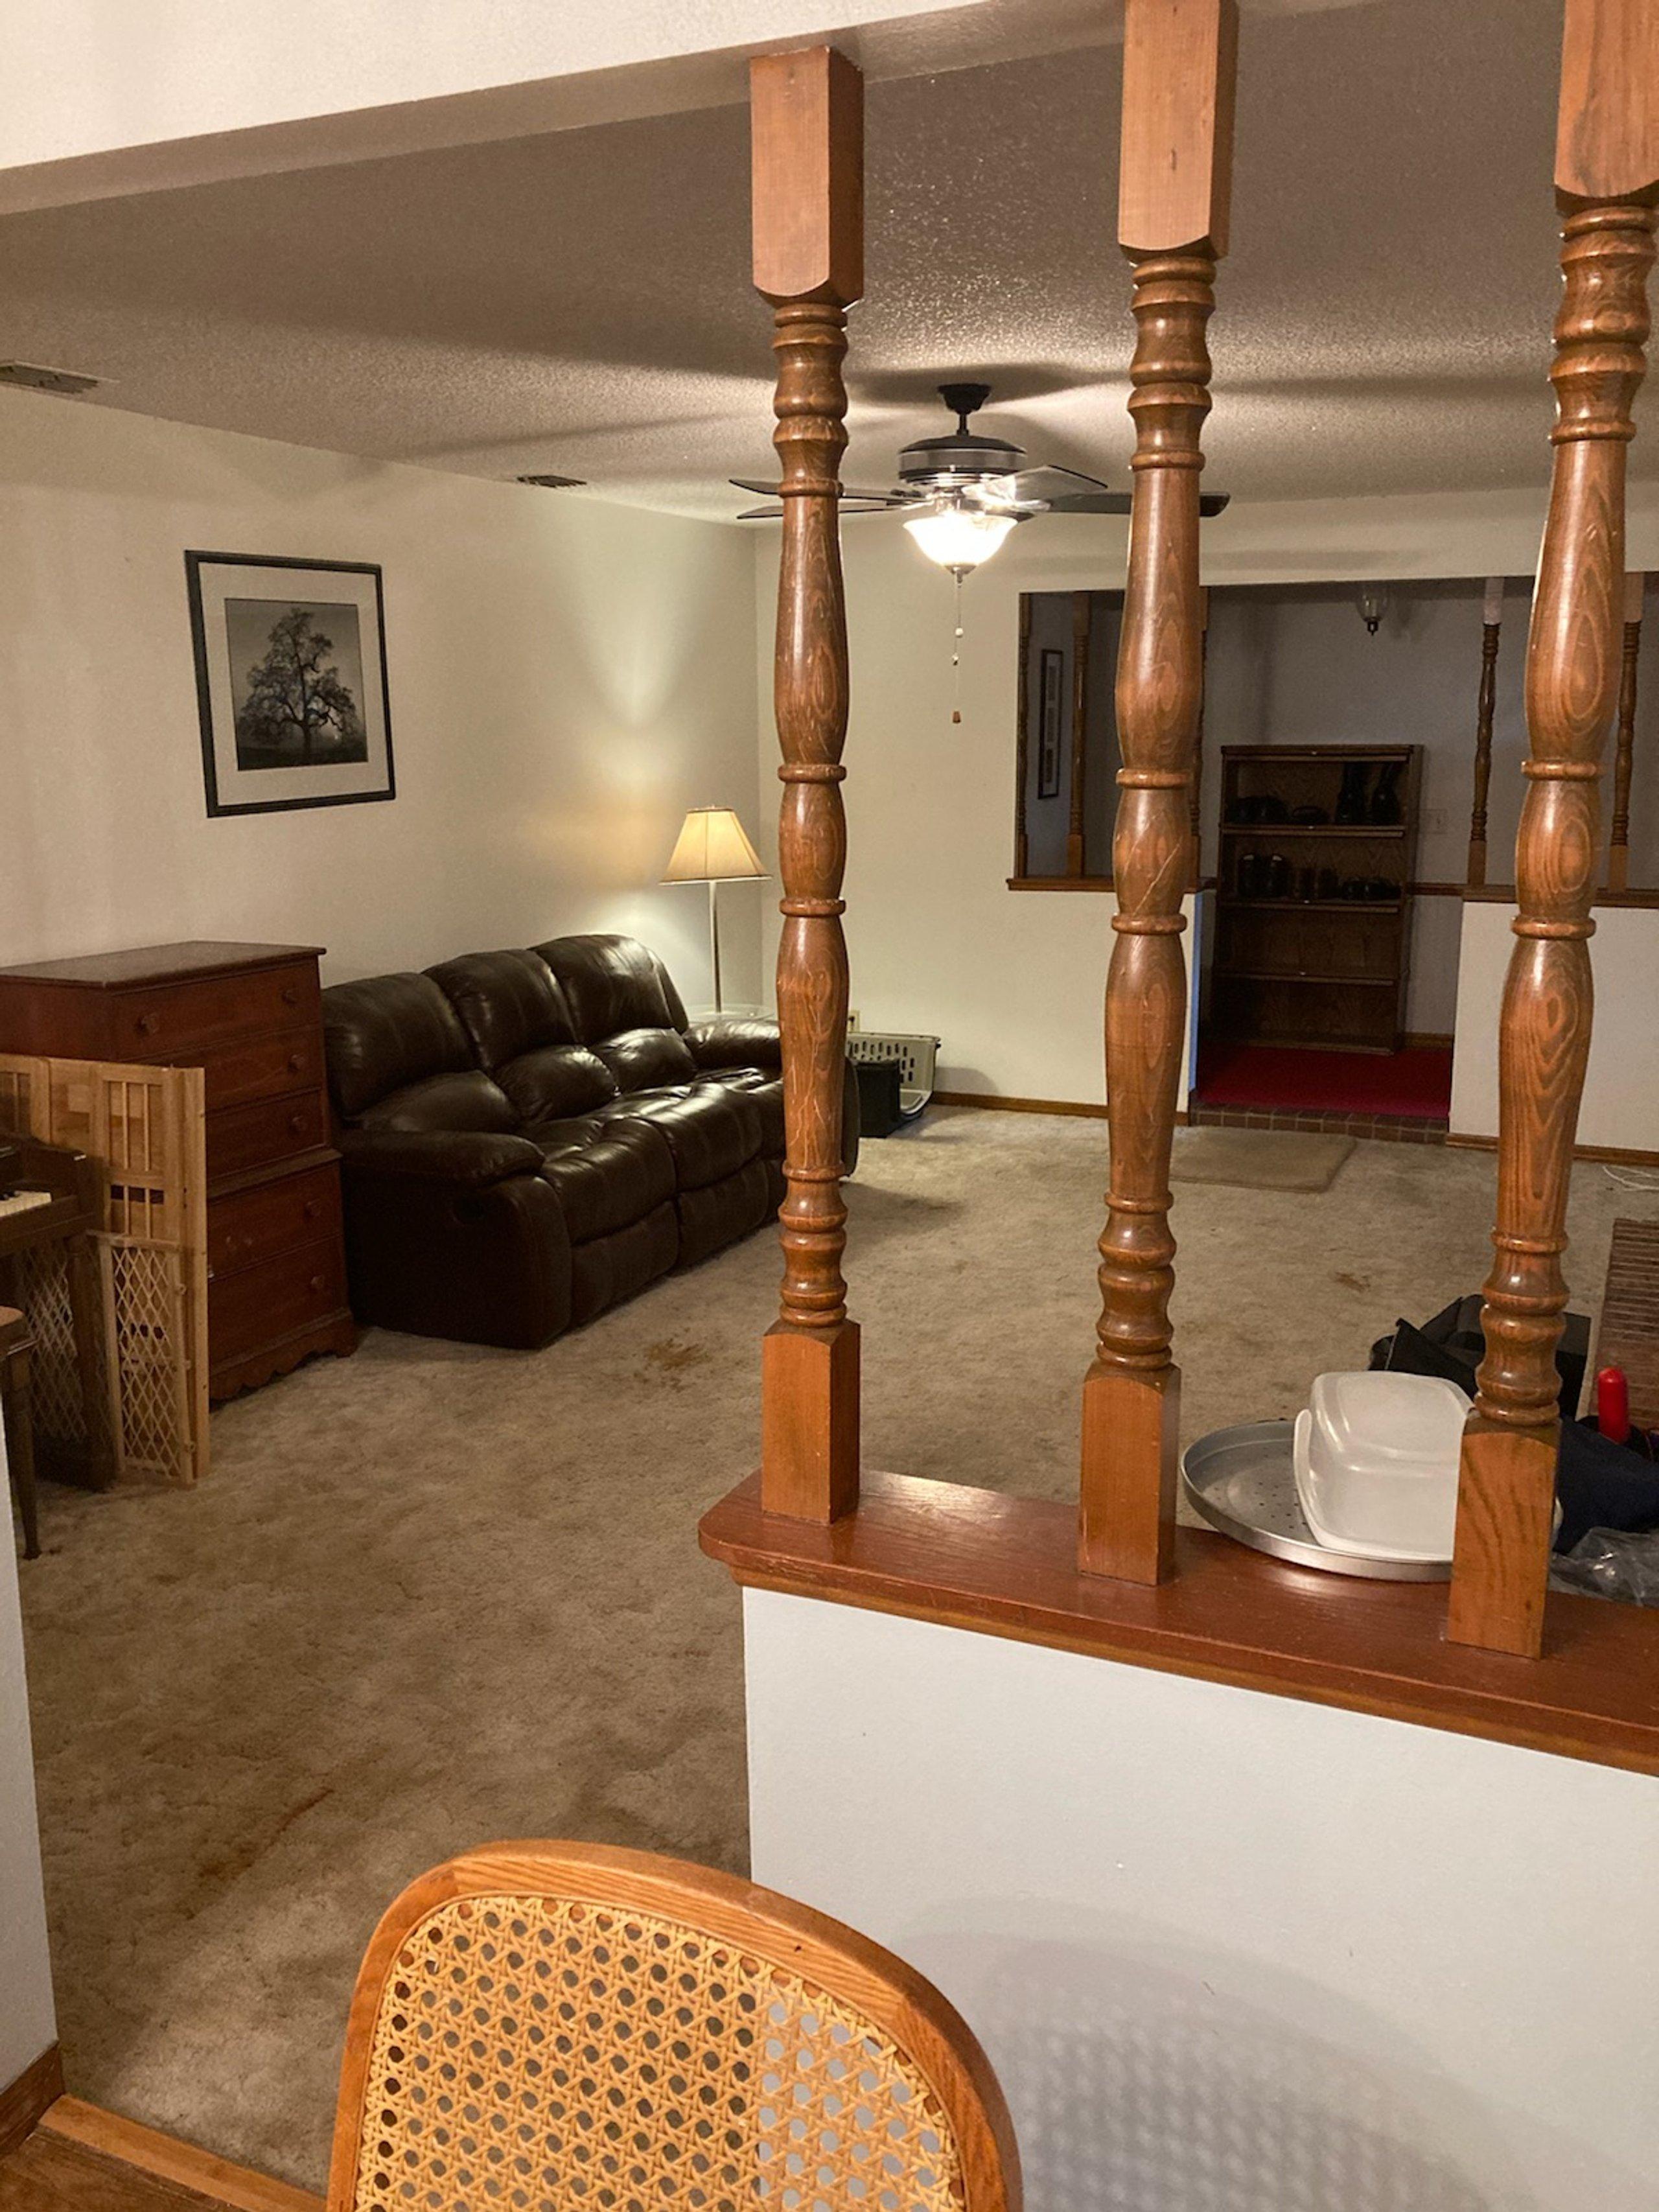 18x9 Bedroom self storage unit